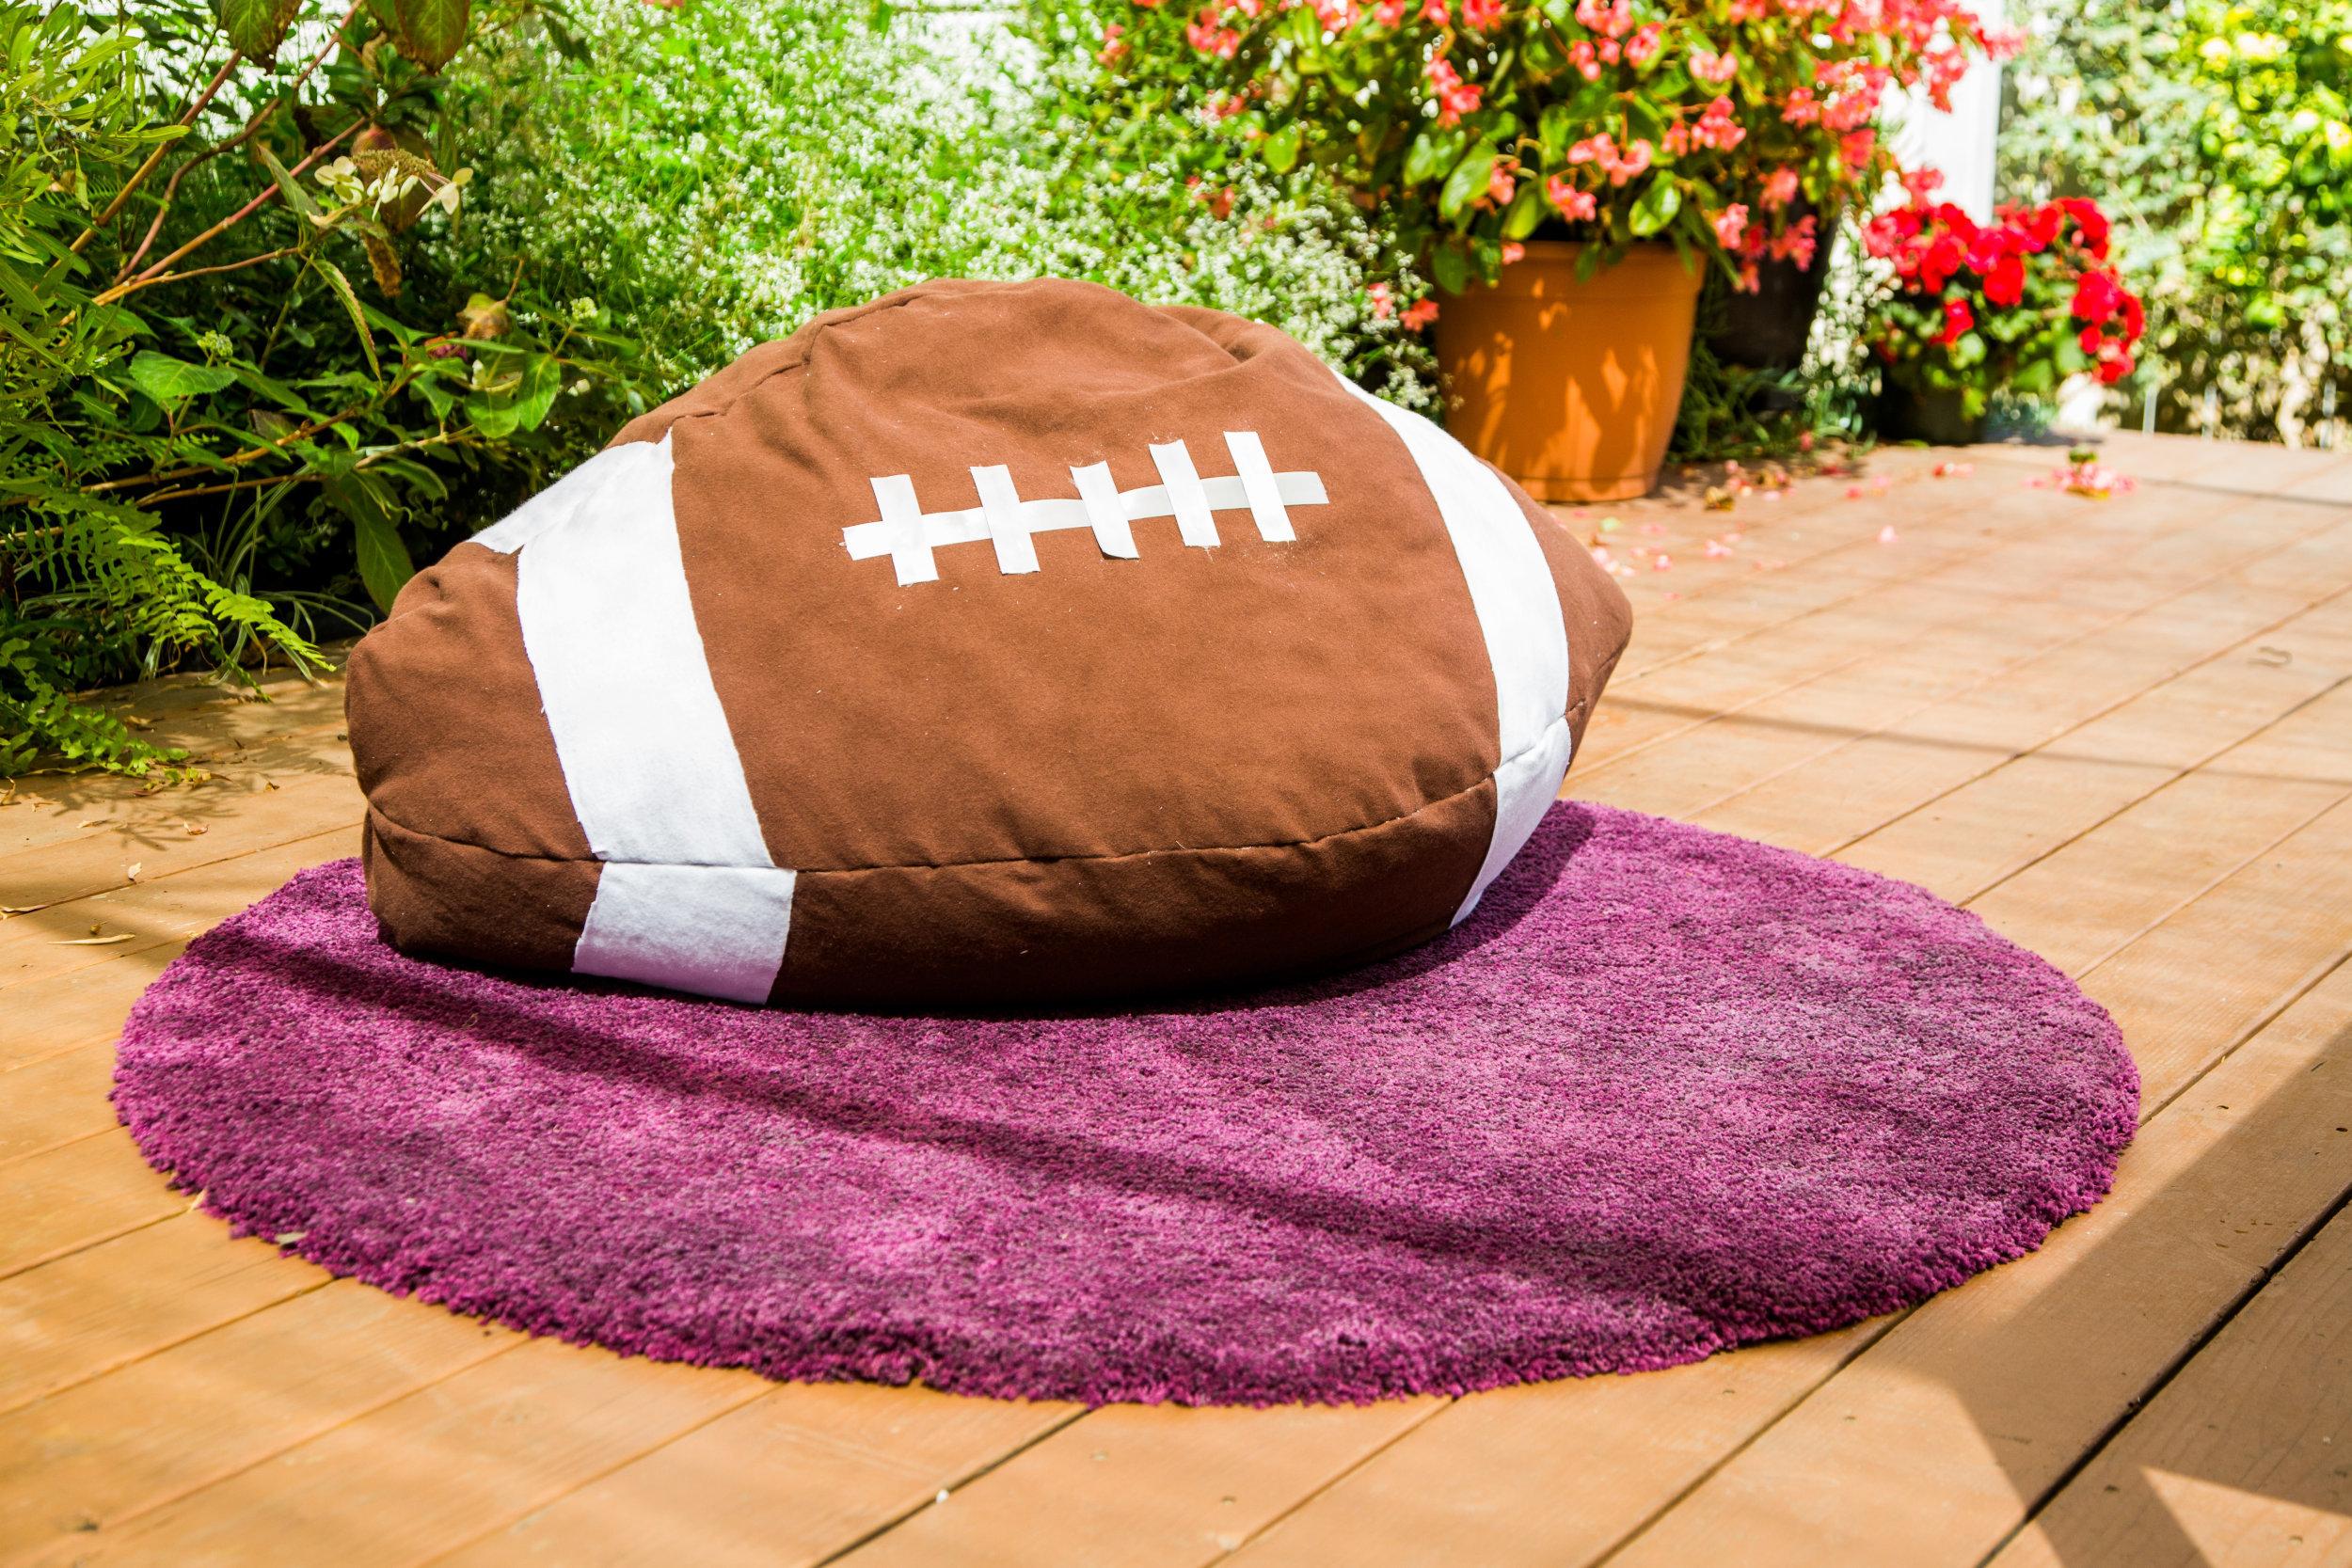 How To Home Amp Family Diy Football Bean Bag Chair